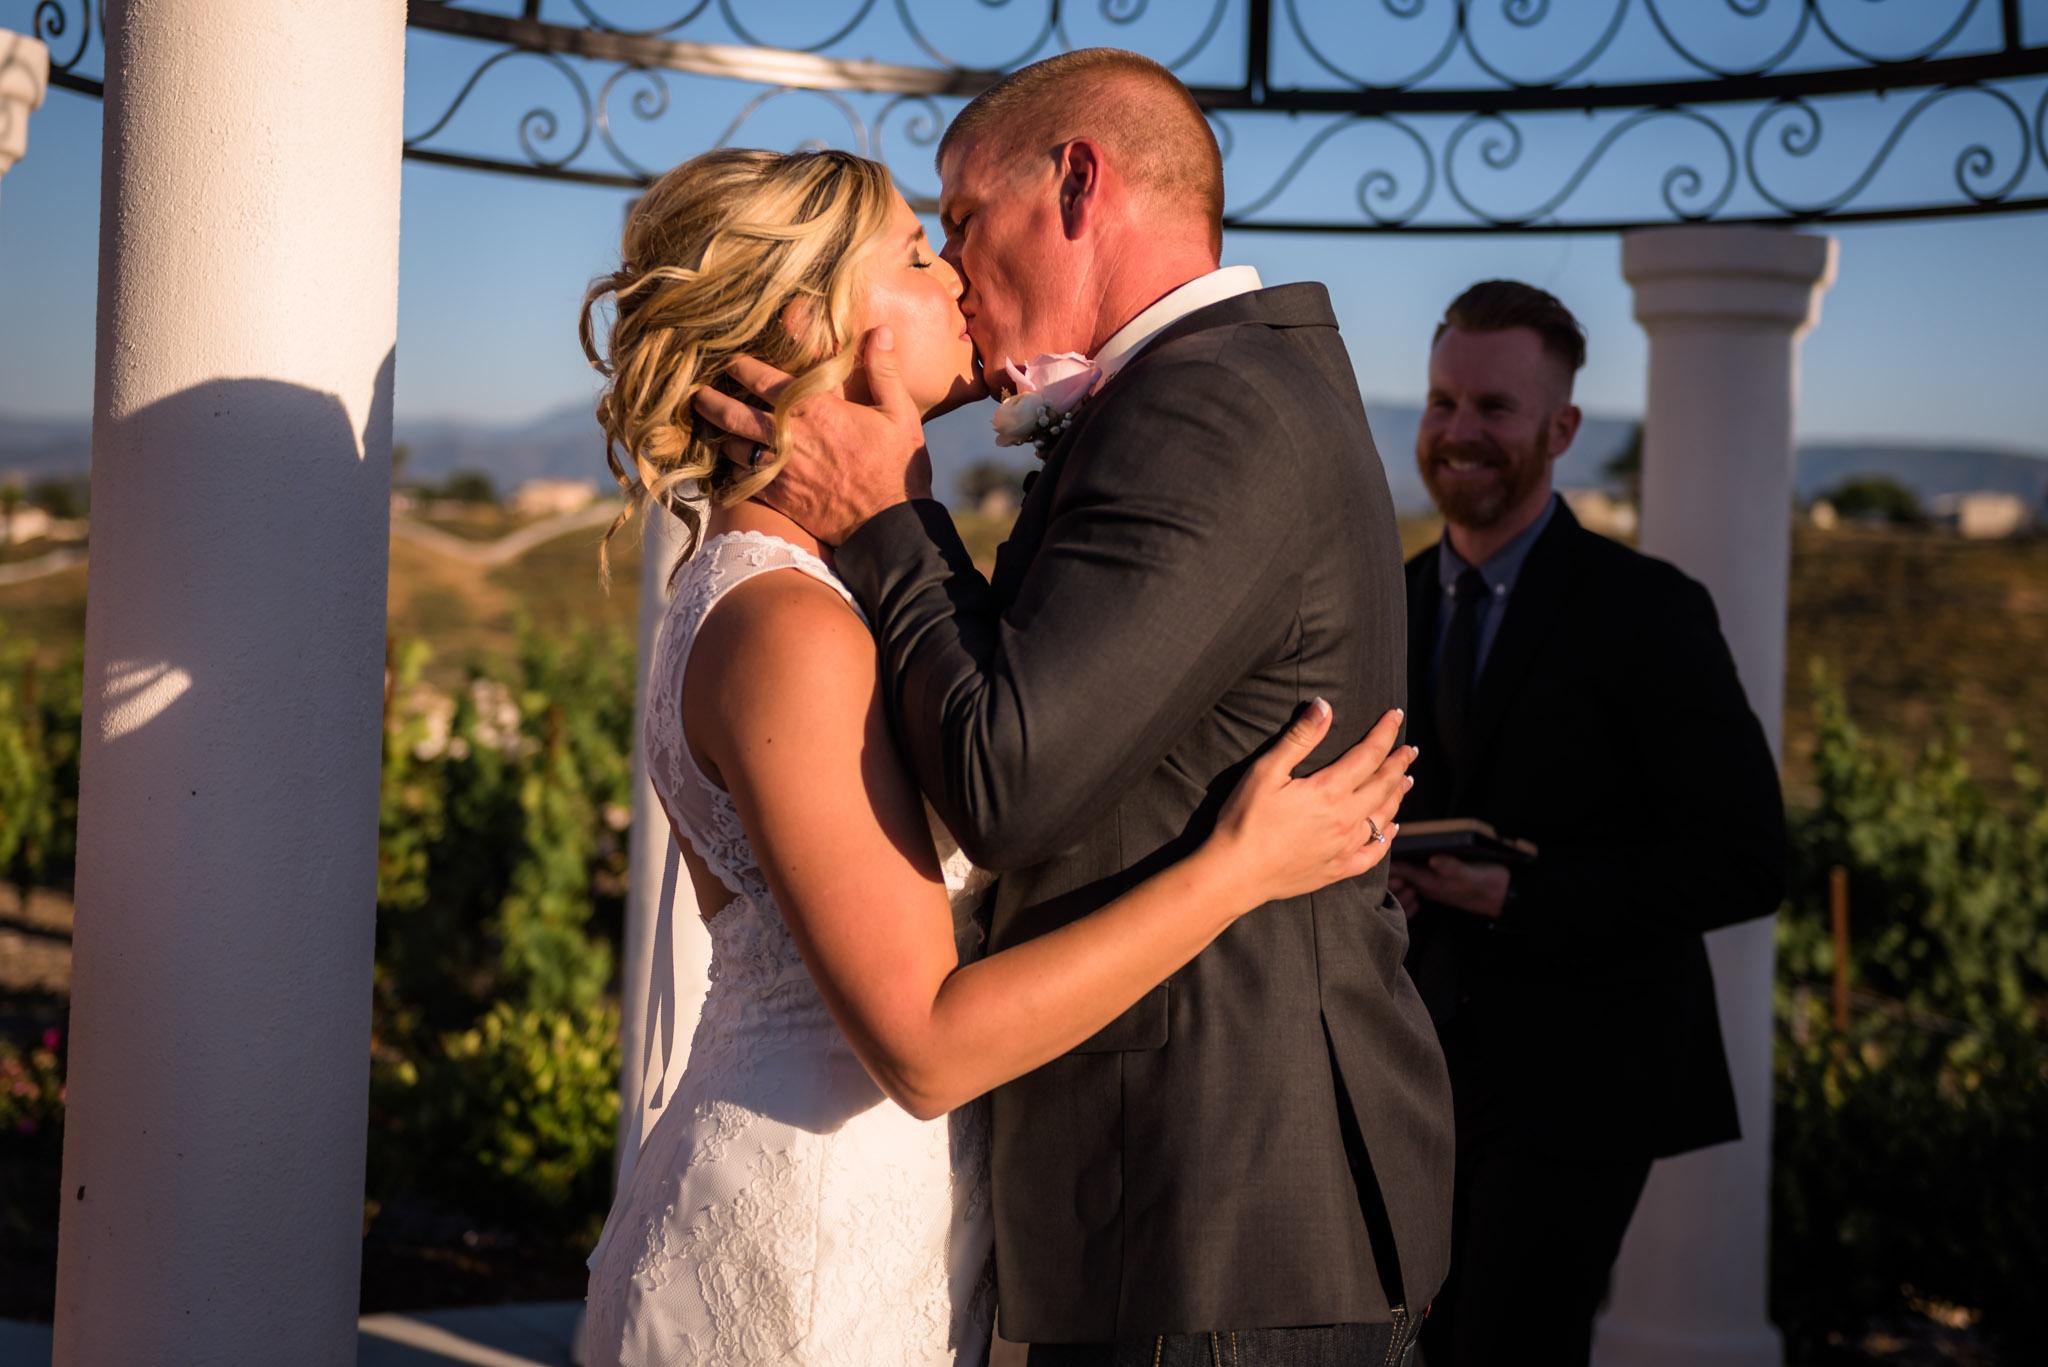 Avensole-Winery-Temecula-Wedding-Josh-and-Olivia-3617.JPG